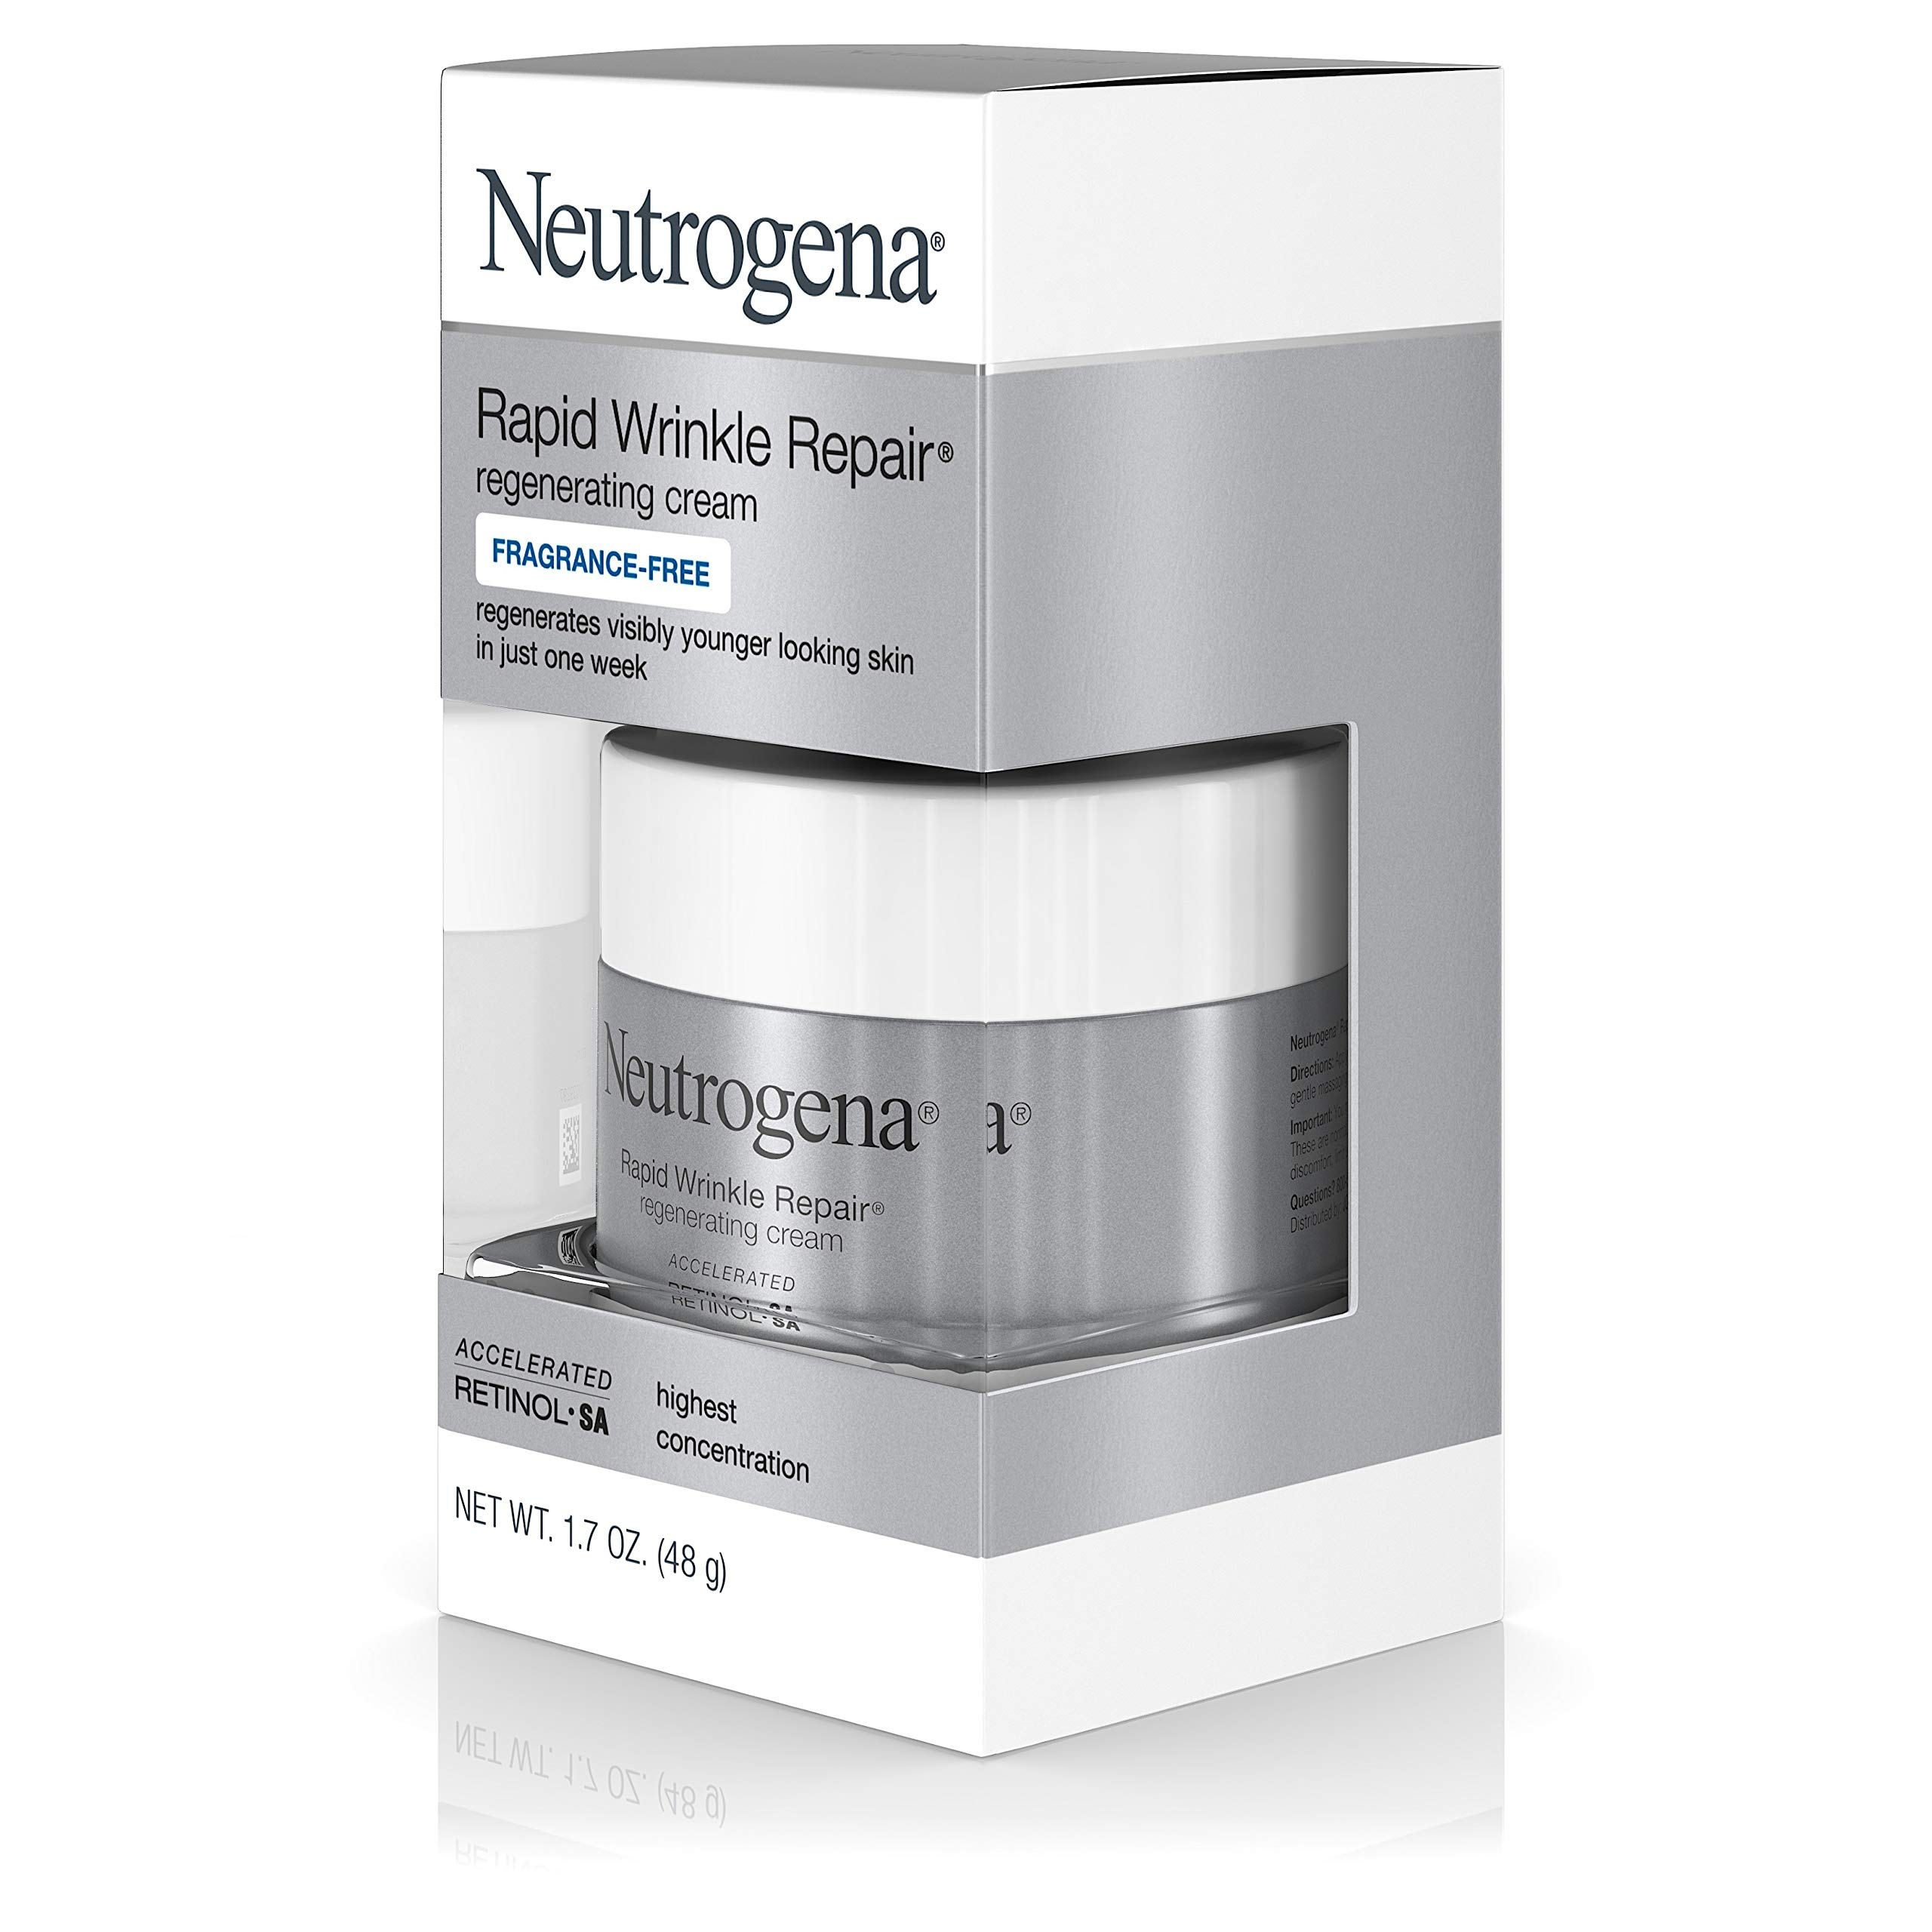 Neutrogena Rapid Wrinkle Repair Hyaluronic Acid Retinol Cream, Anti Wrinkle Cream, Face Moisturizer, Neck Cream & Dark Spot Remover for Face - Day & Night Cream with Hyaluronic Acid & Retinol, 1.7 oz by Neutrogena (Image #8)